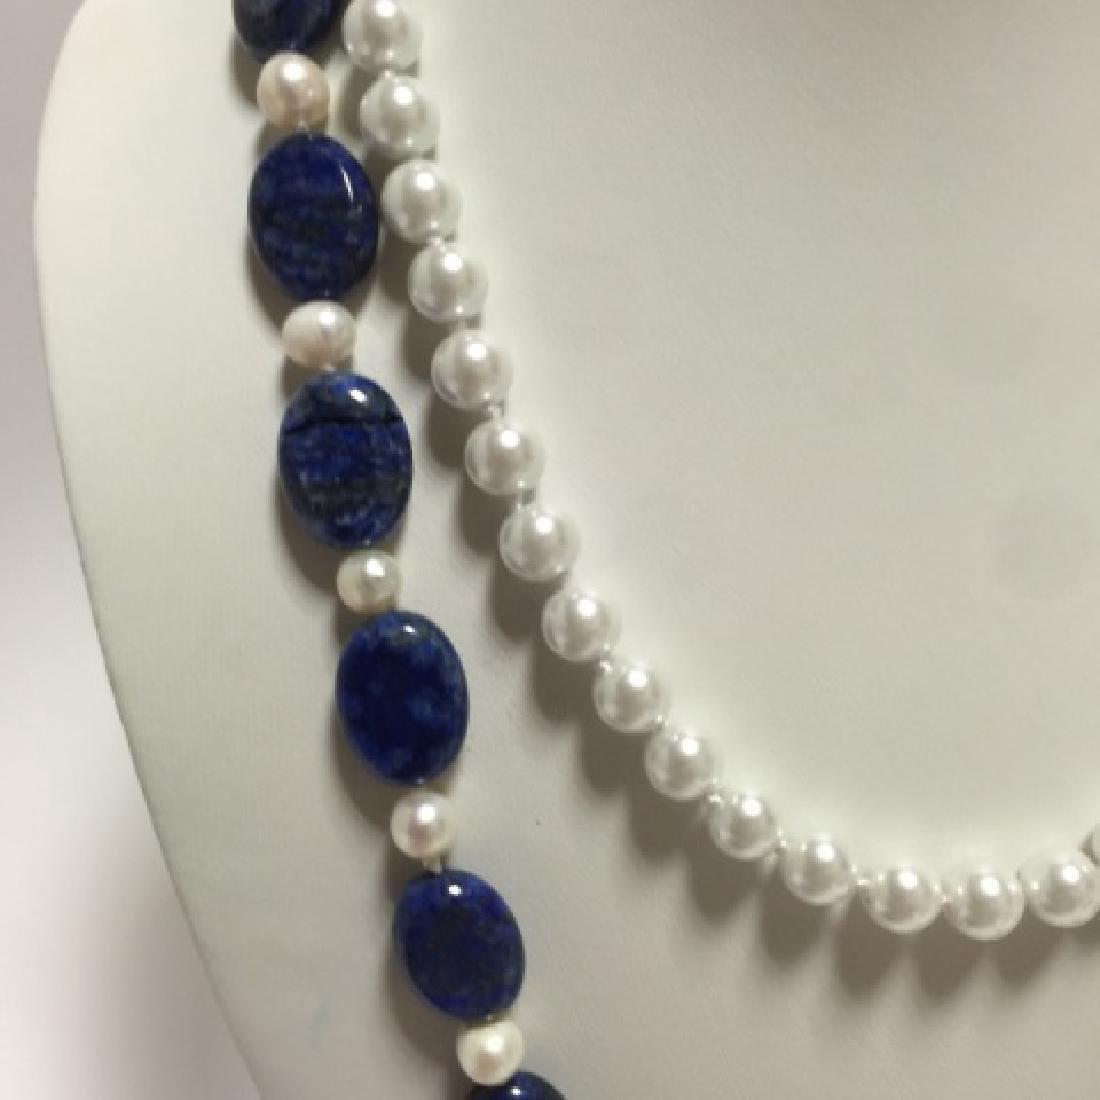 Lapis Lazuli Bead & Baroque Style Pearl Necklace - 3